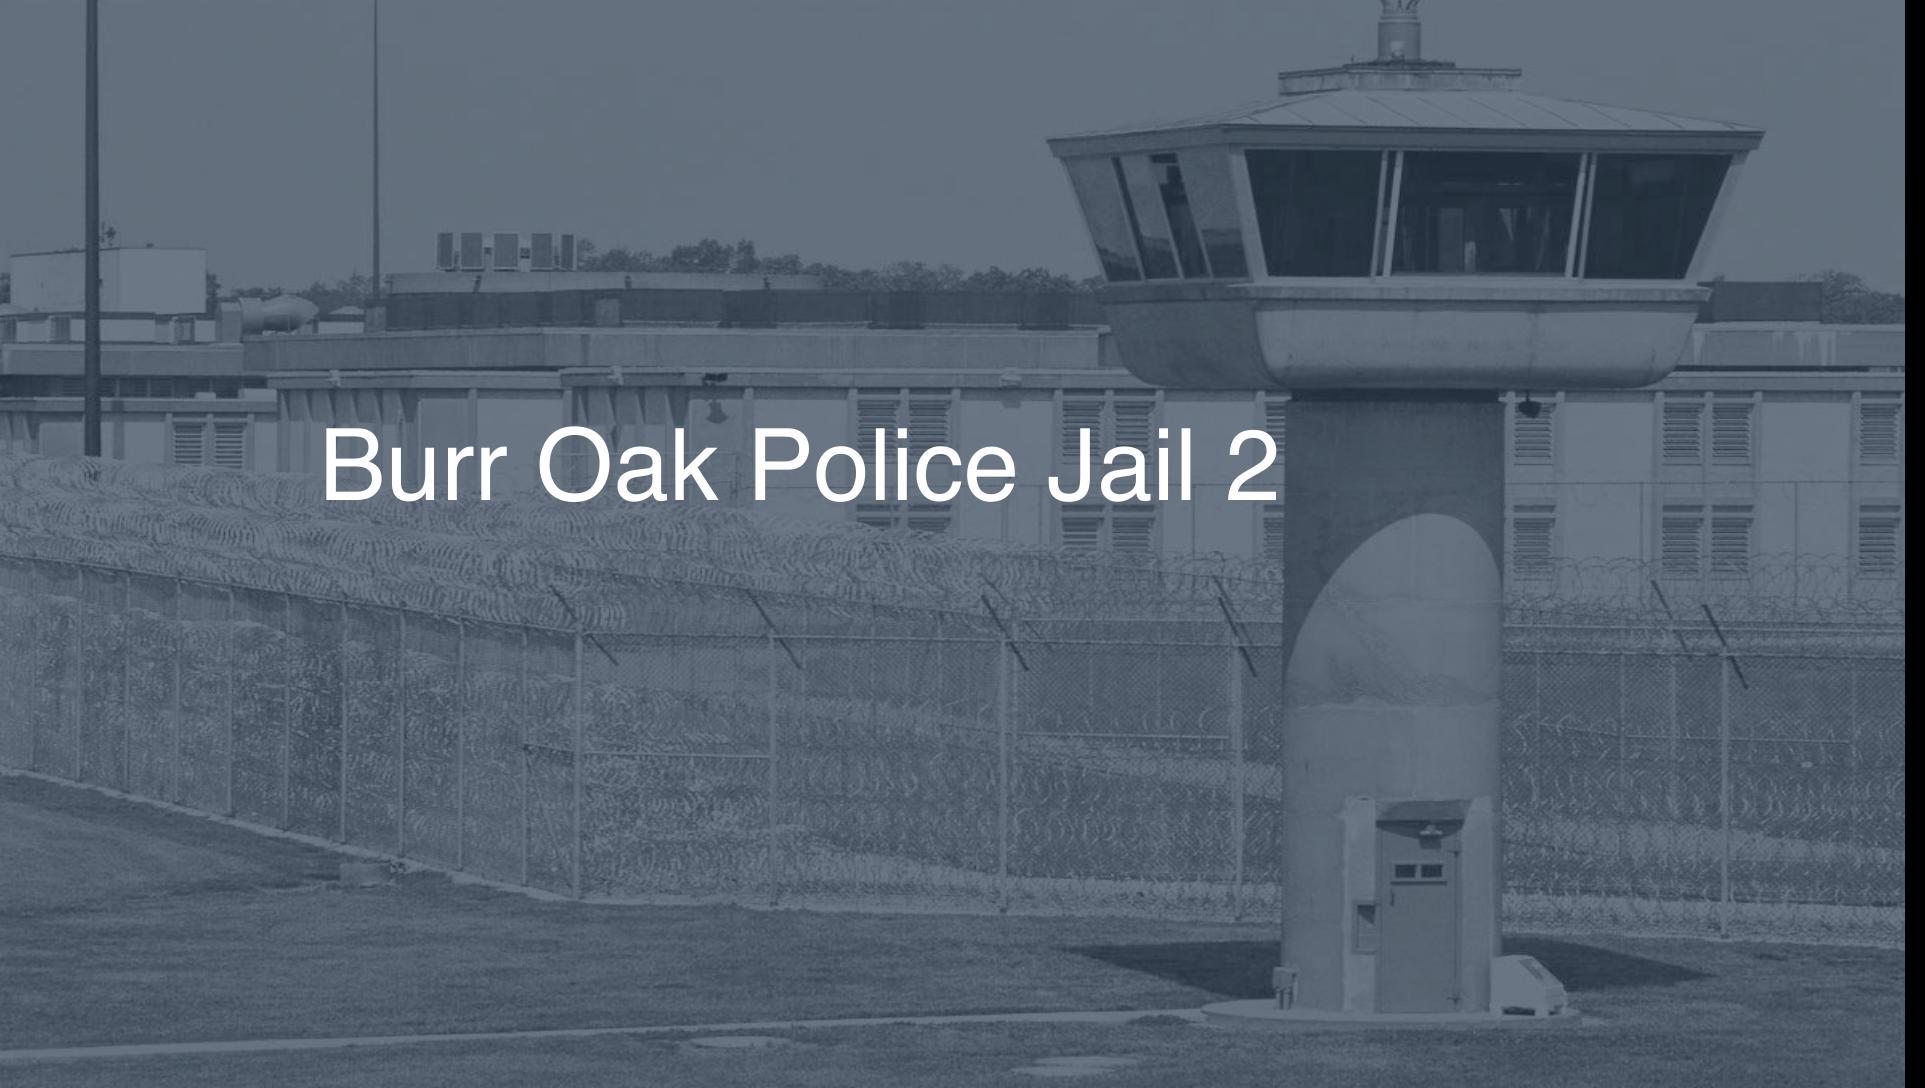 Burr Oak Police Jail correctional facility picture